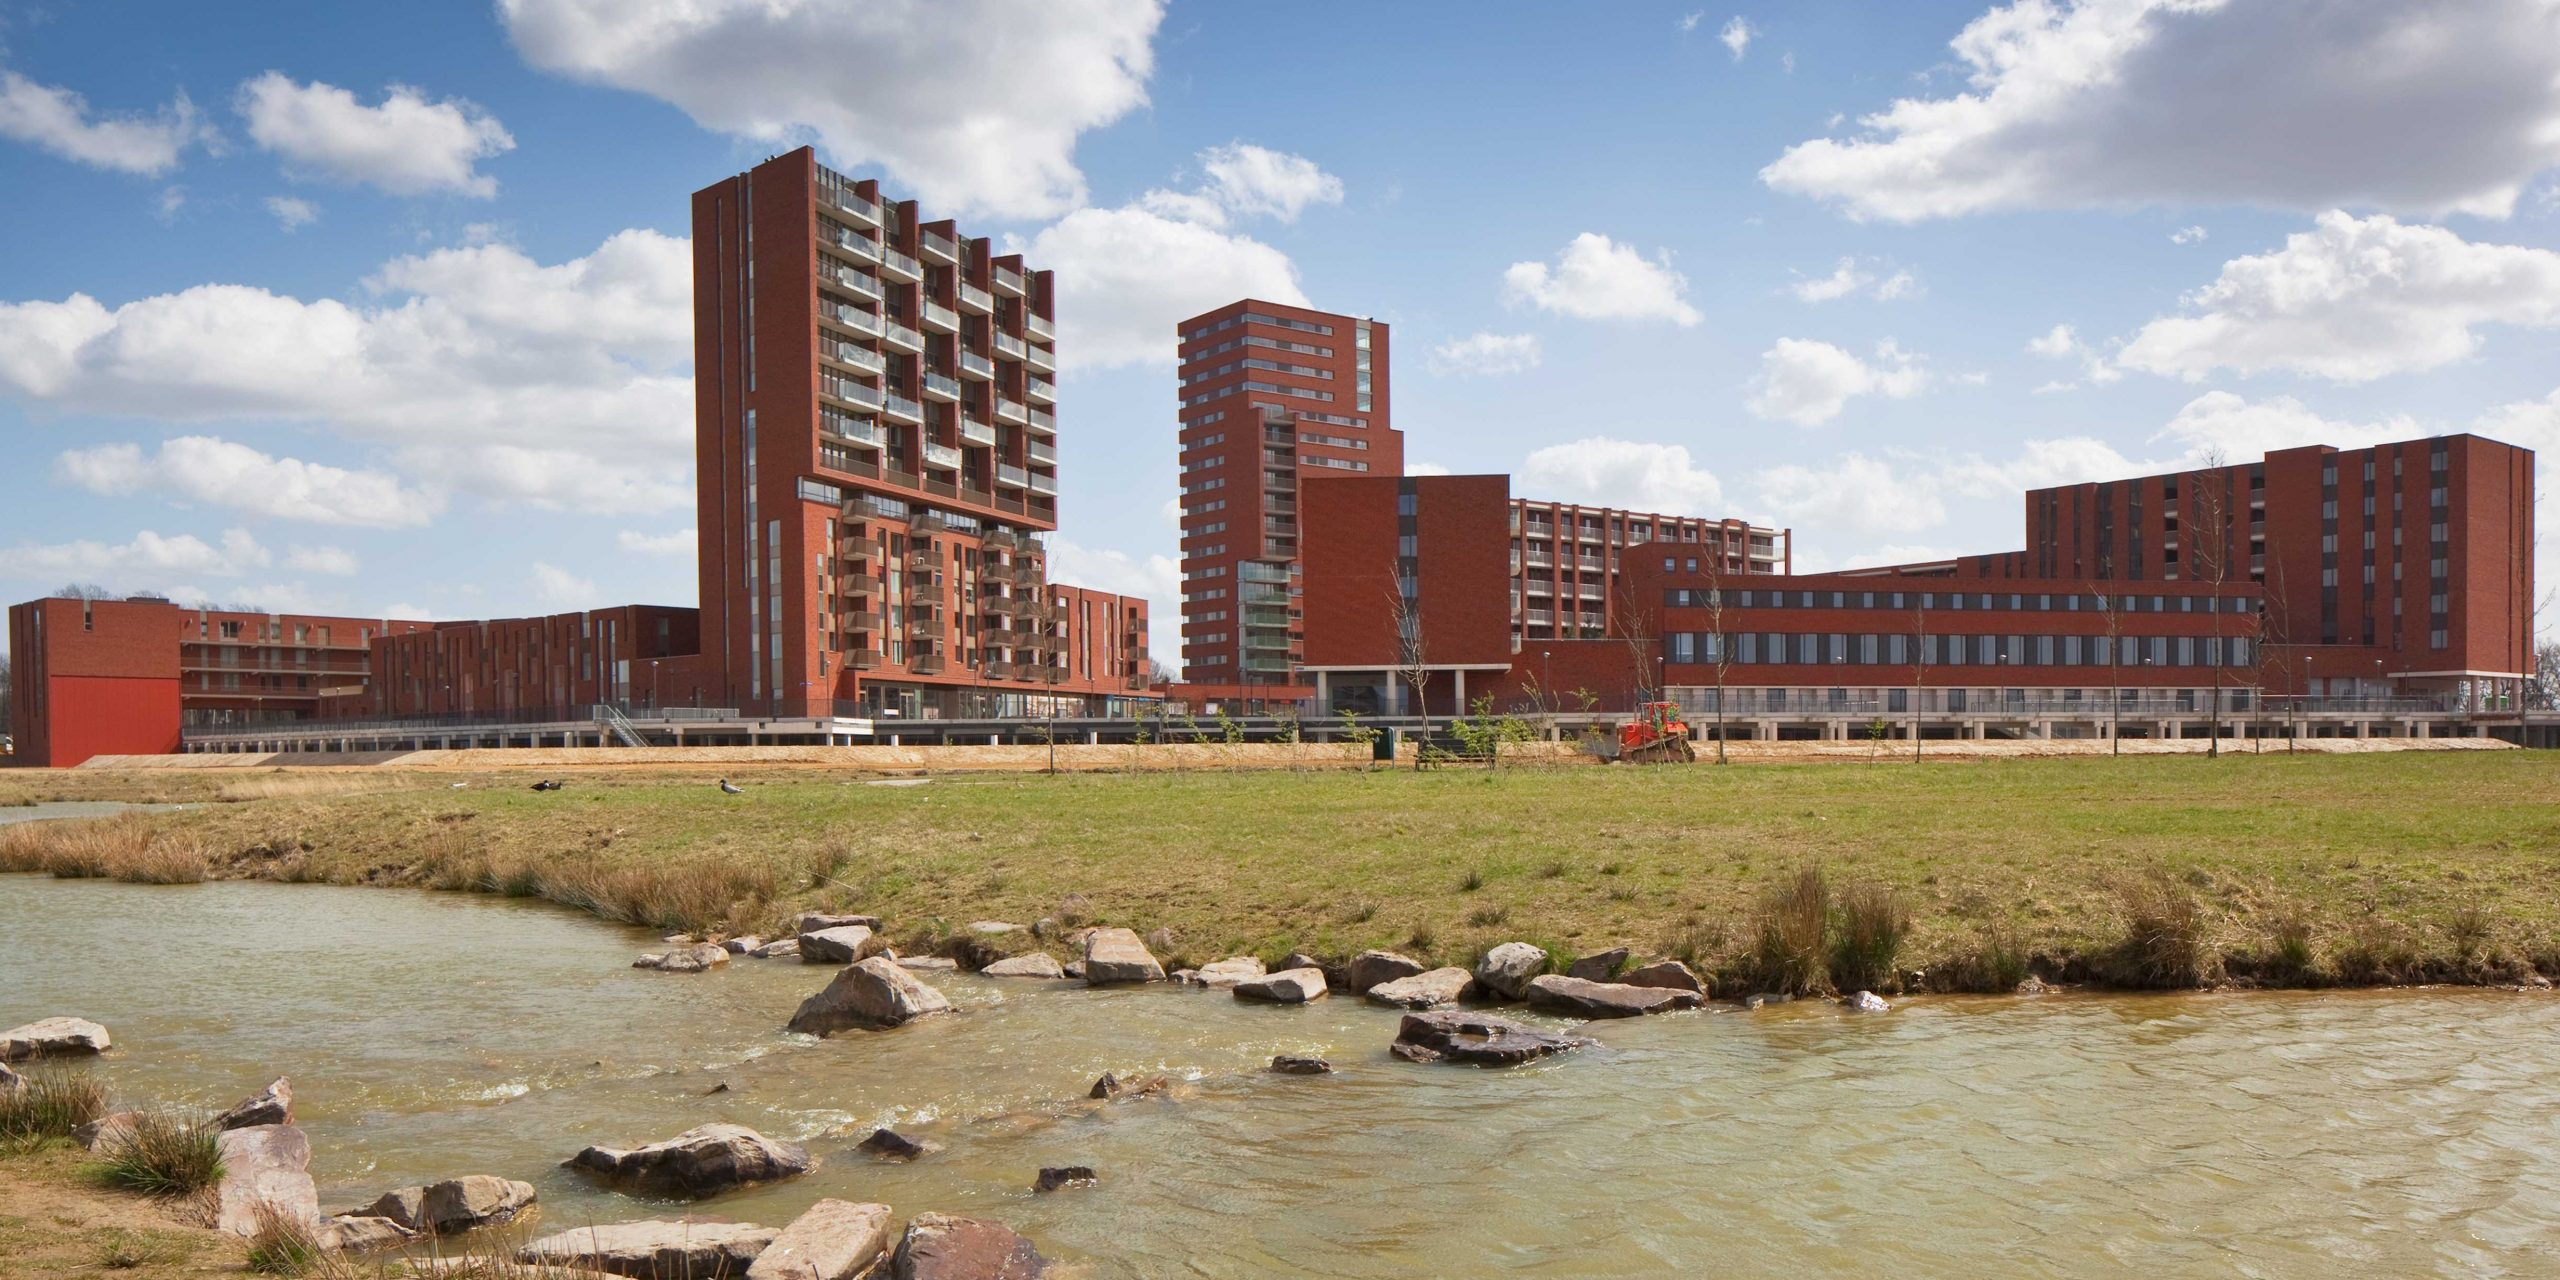 wUrck_Meerrijk-Blok-A_Foto-Frank-Hanswijk-1-e1525355006776